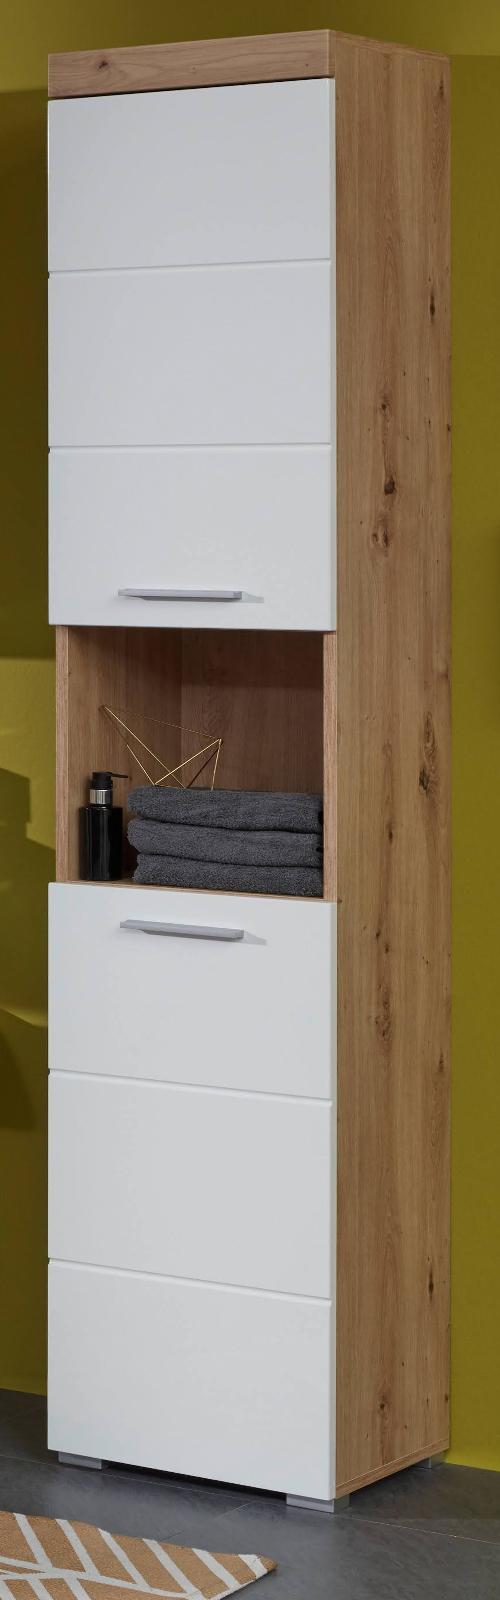 Vorhang Etagenbett Selber Nähen : Vorhang etagenbett selber nähen u zuhause image idee